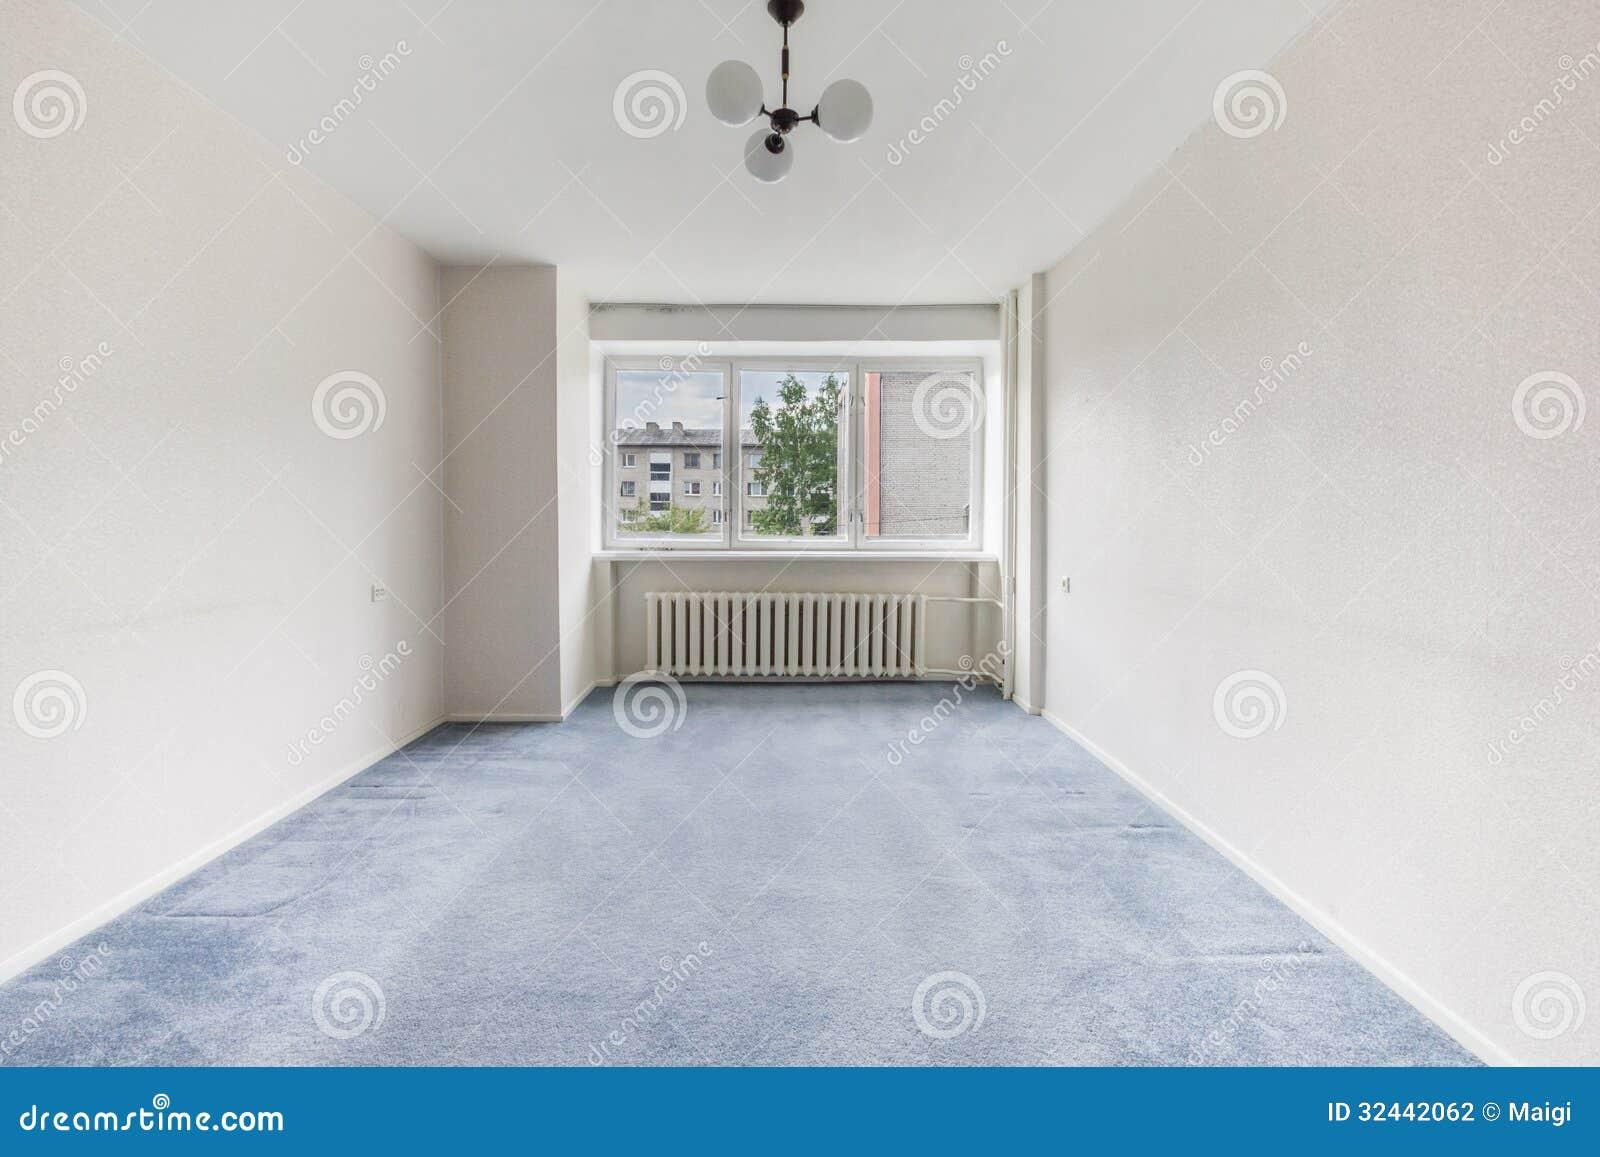 Empty Room Stock Photography Image 32442062